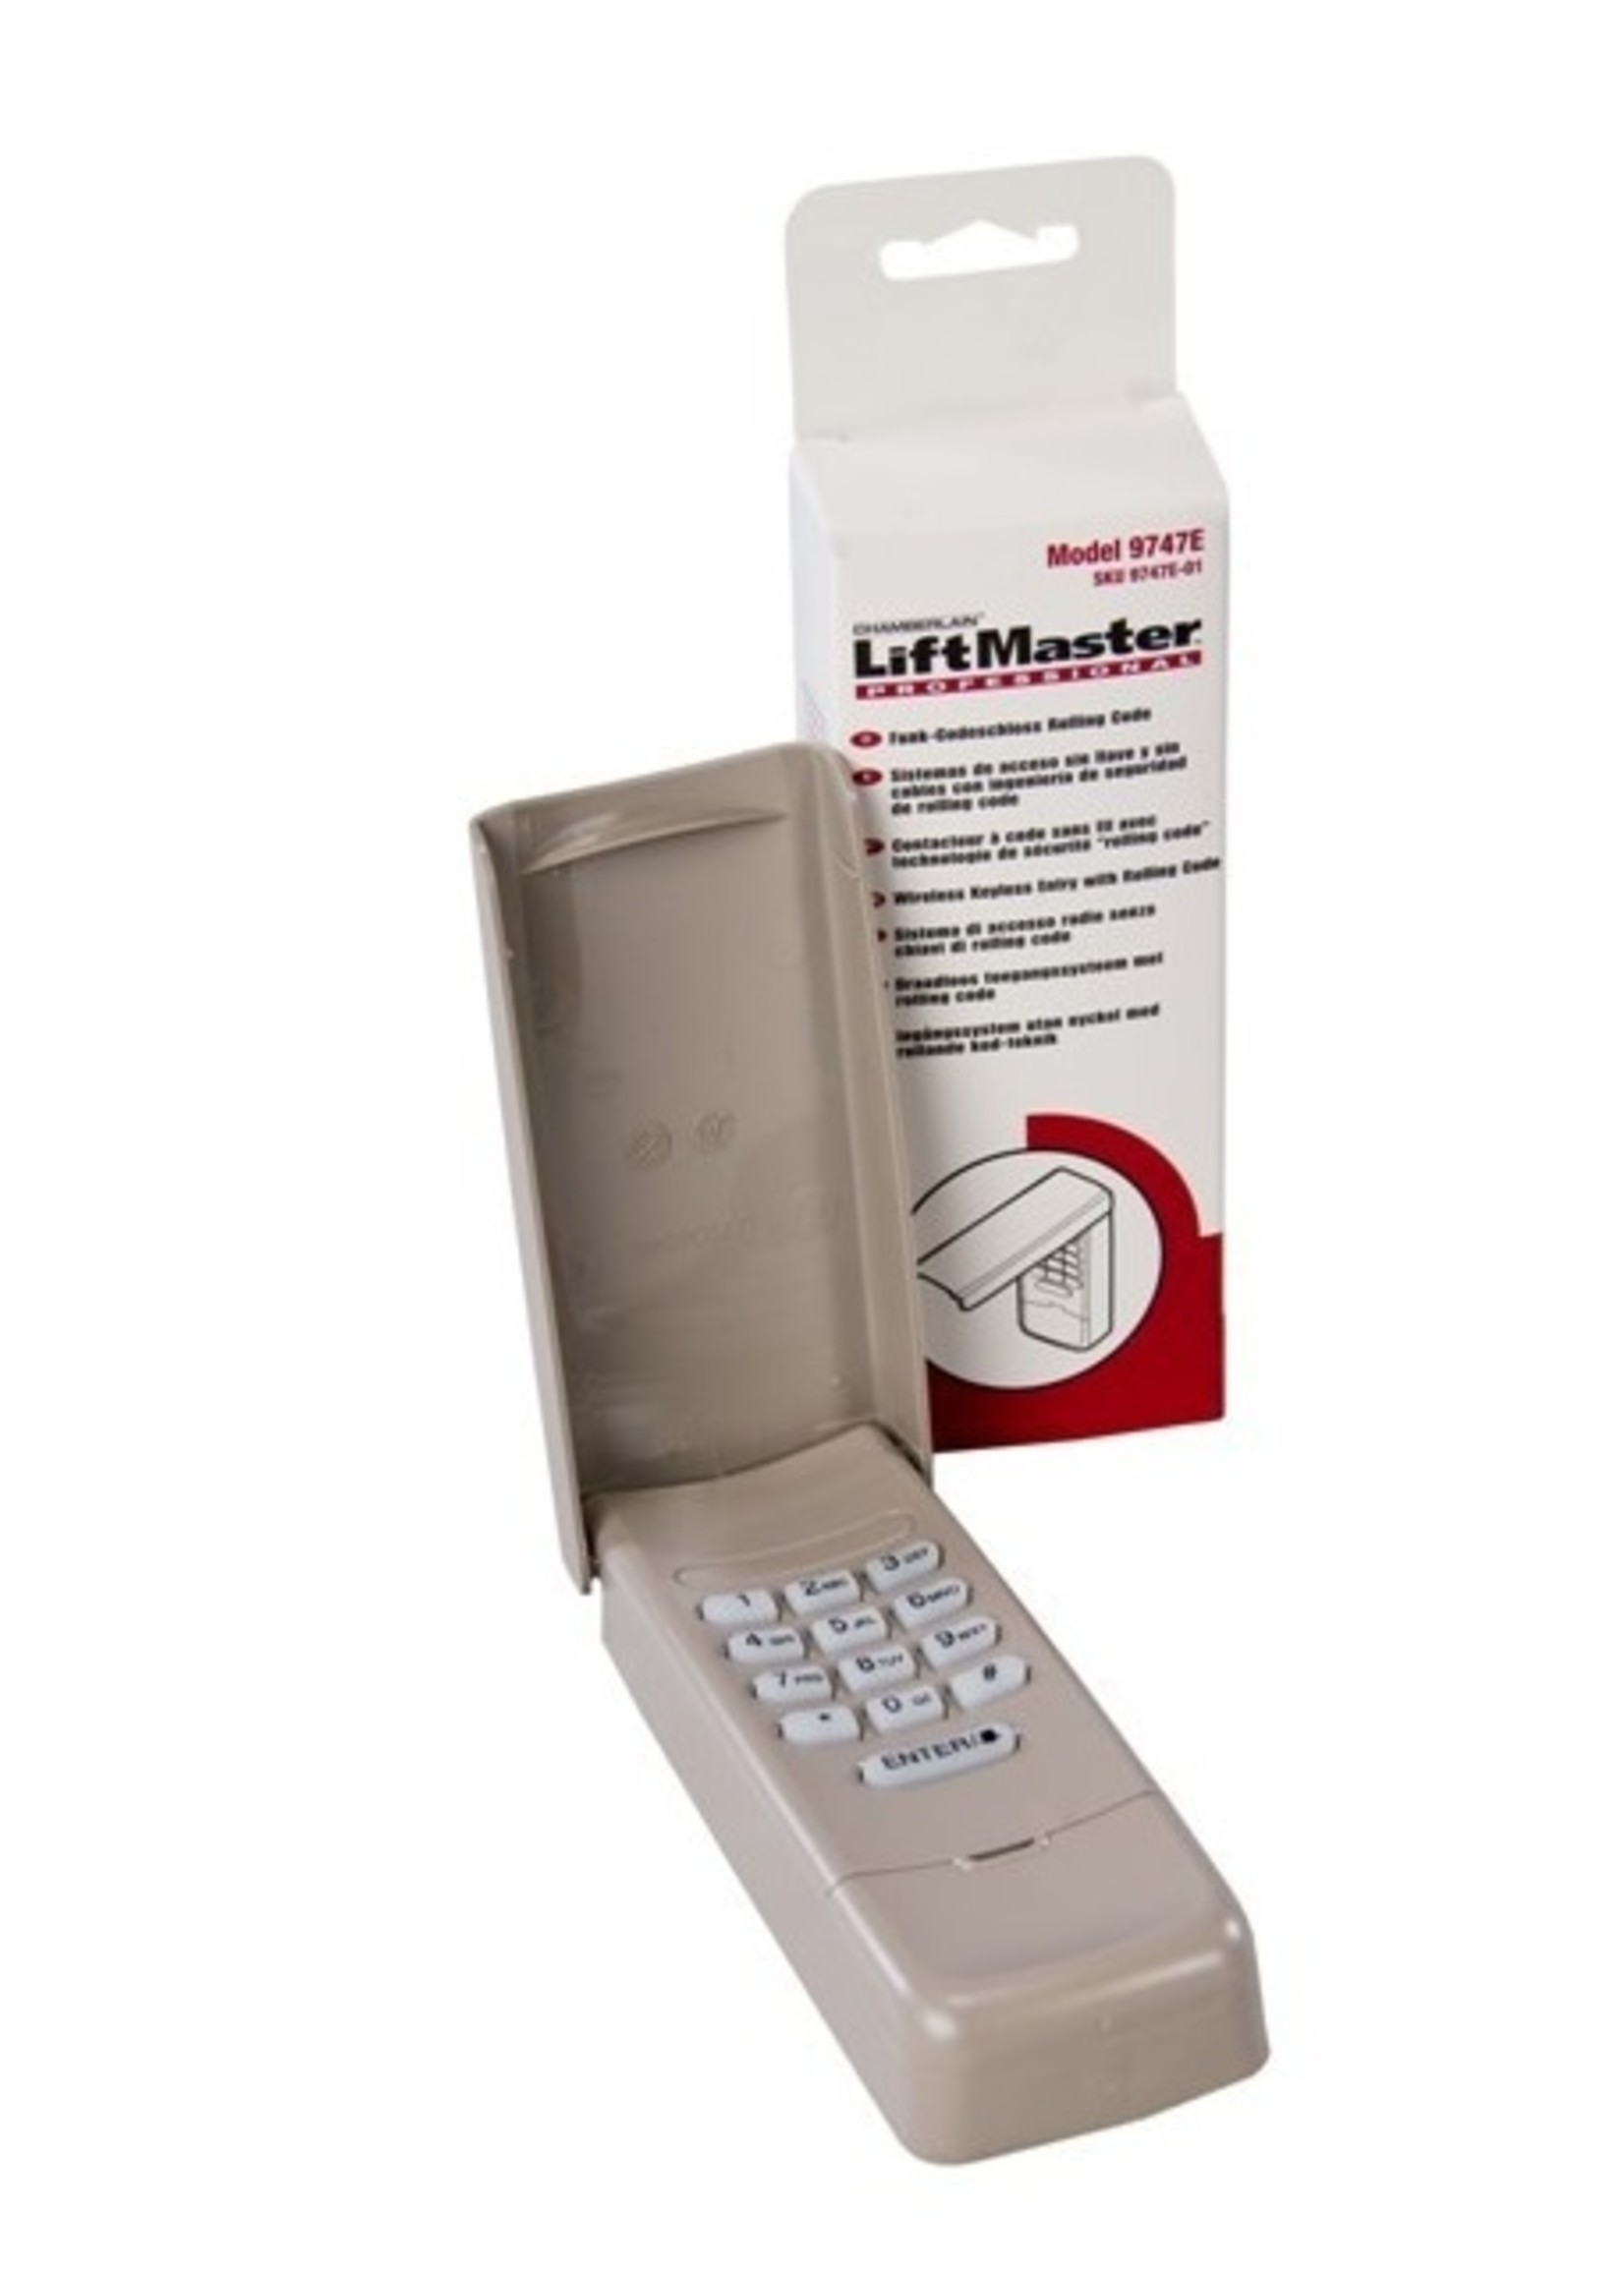 Liftmaster 9747E Digicode sans fil modèle 8747EML Rolling Code